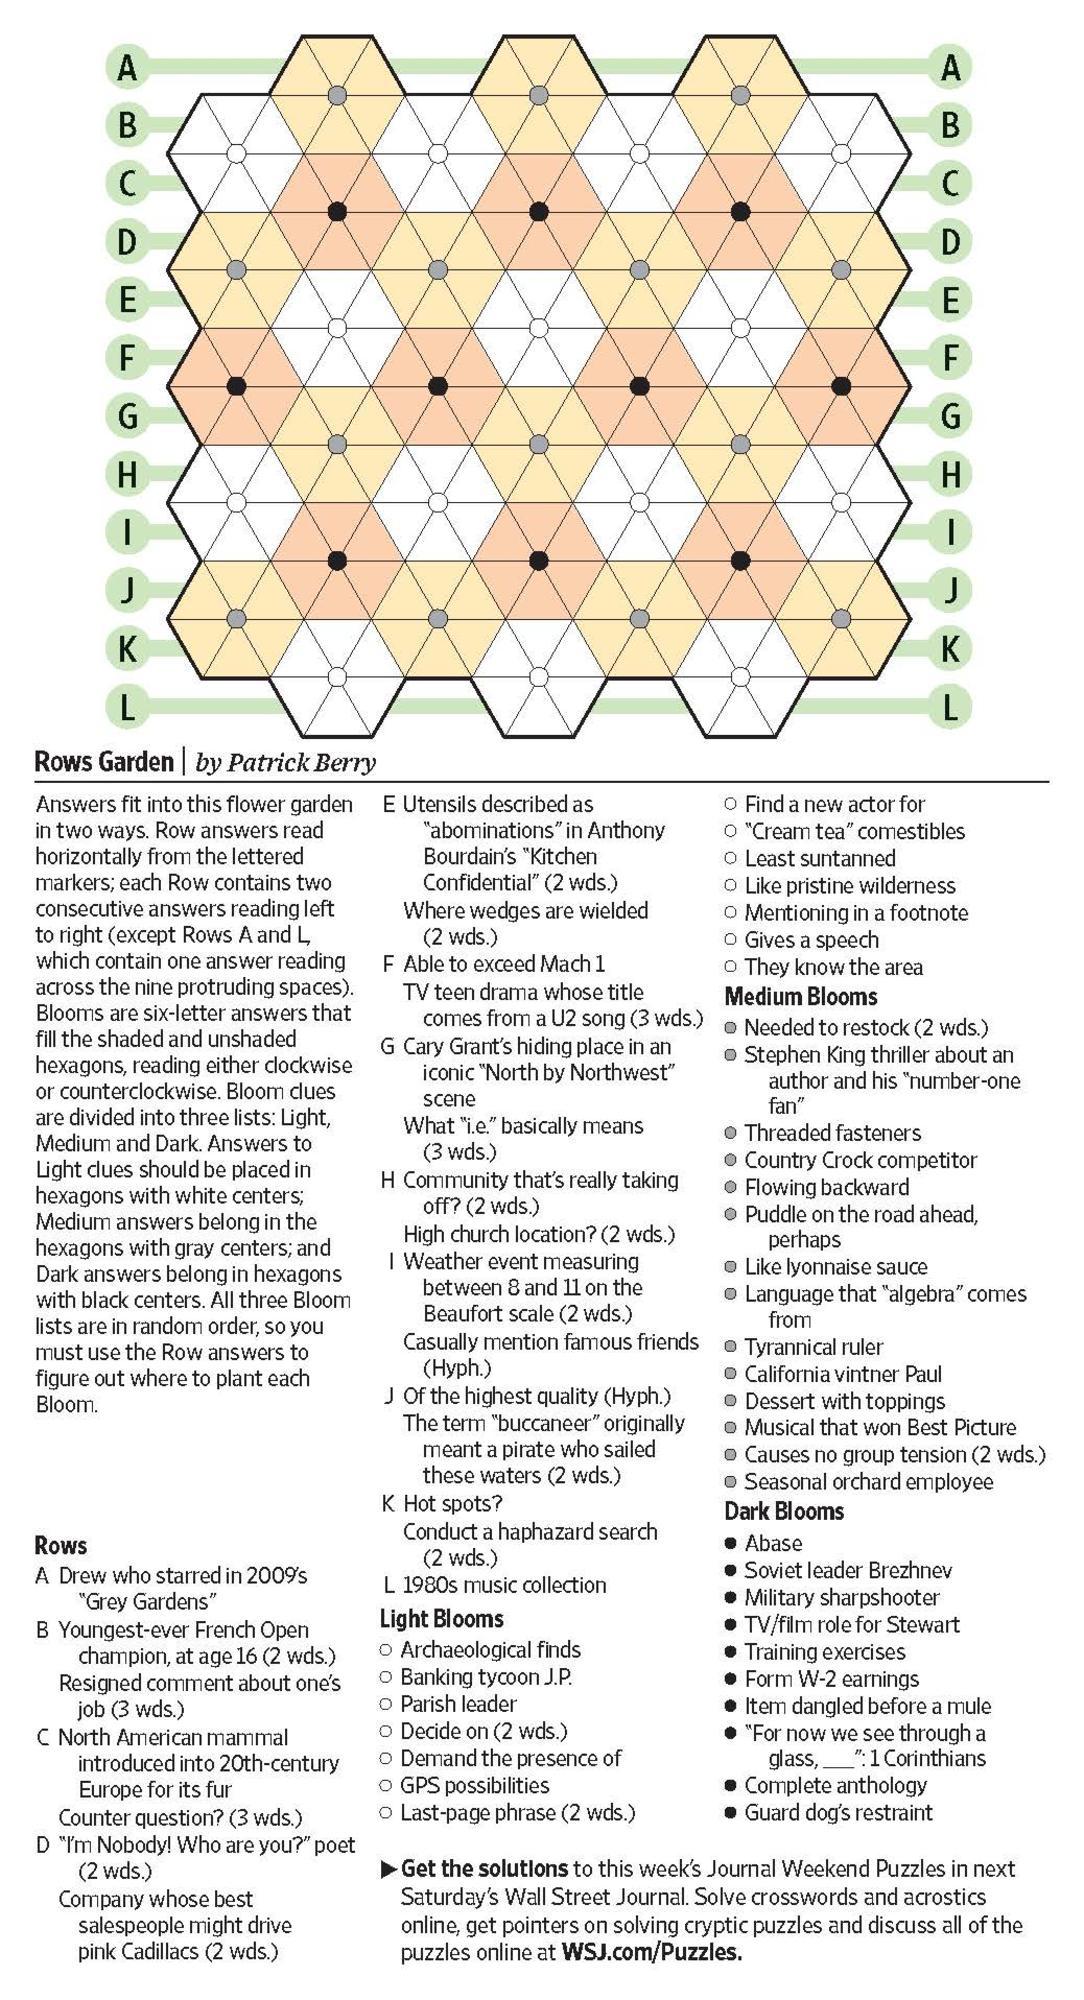 Rows Garden (Saturday Puzzle) - Wsj Puzzles - Wsj - Printable Crossword Puzzles Wsj